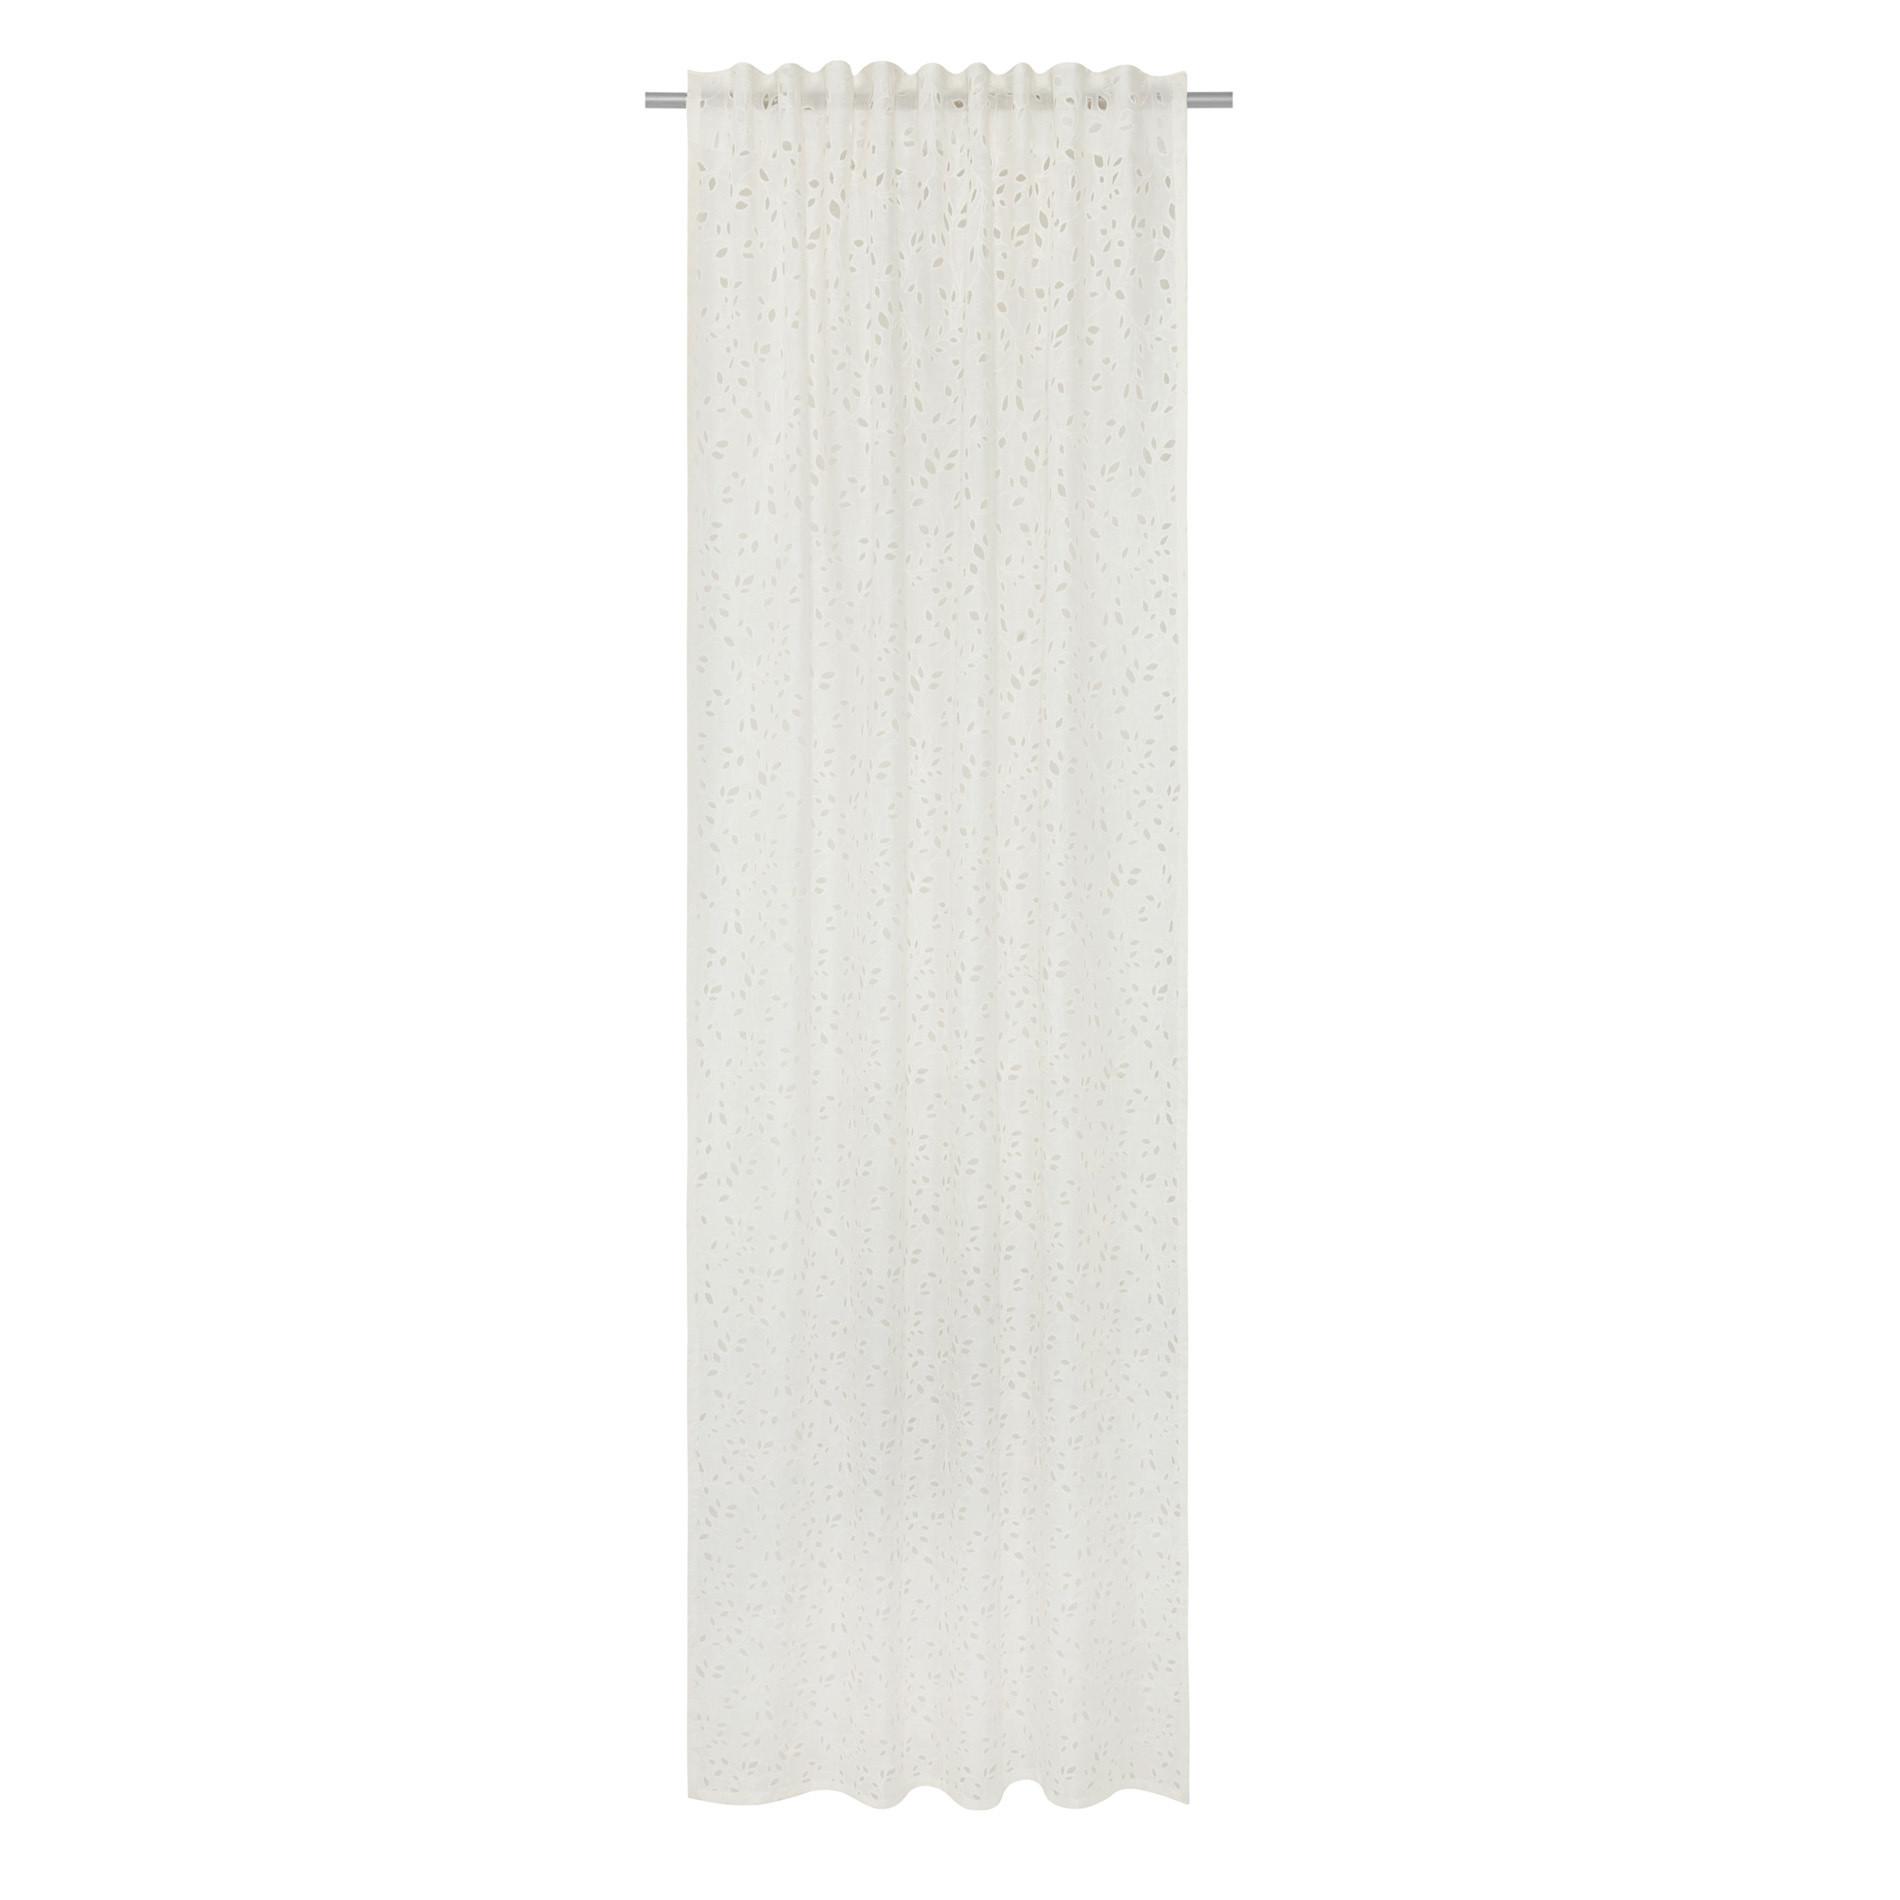 Tenda lino sangallo passanti nascosti, Bianco, large image number 2